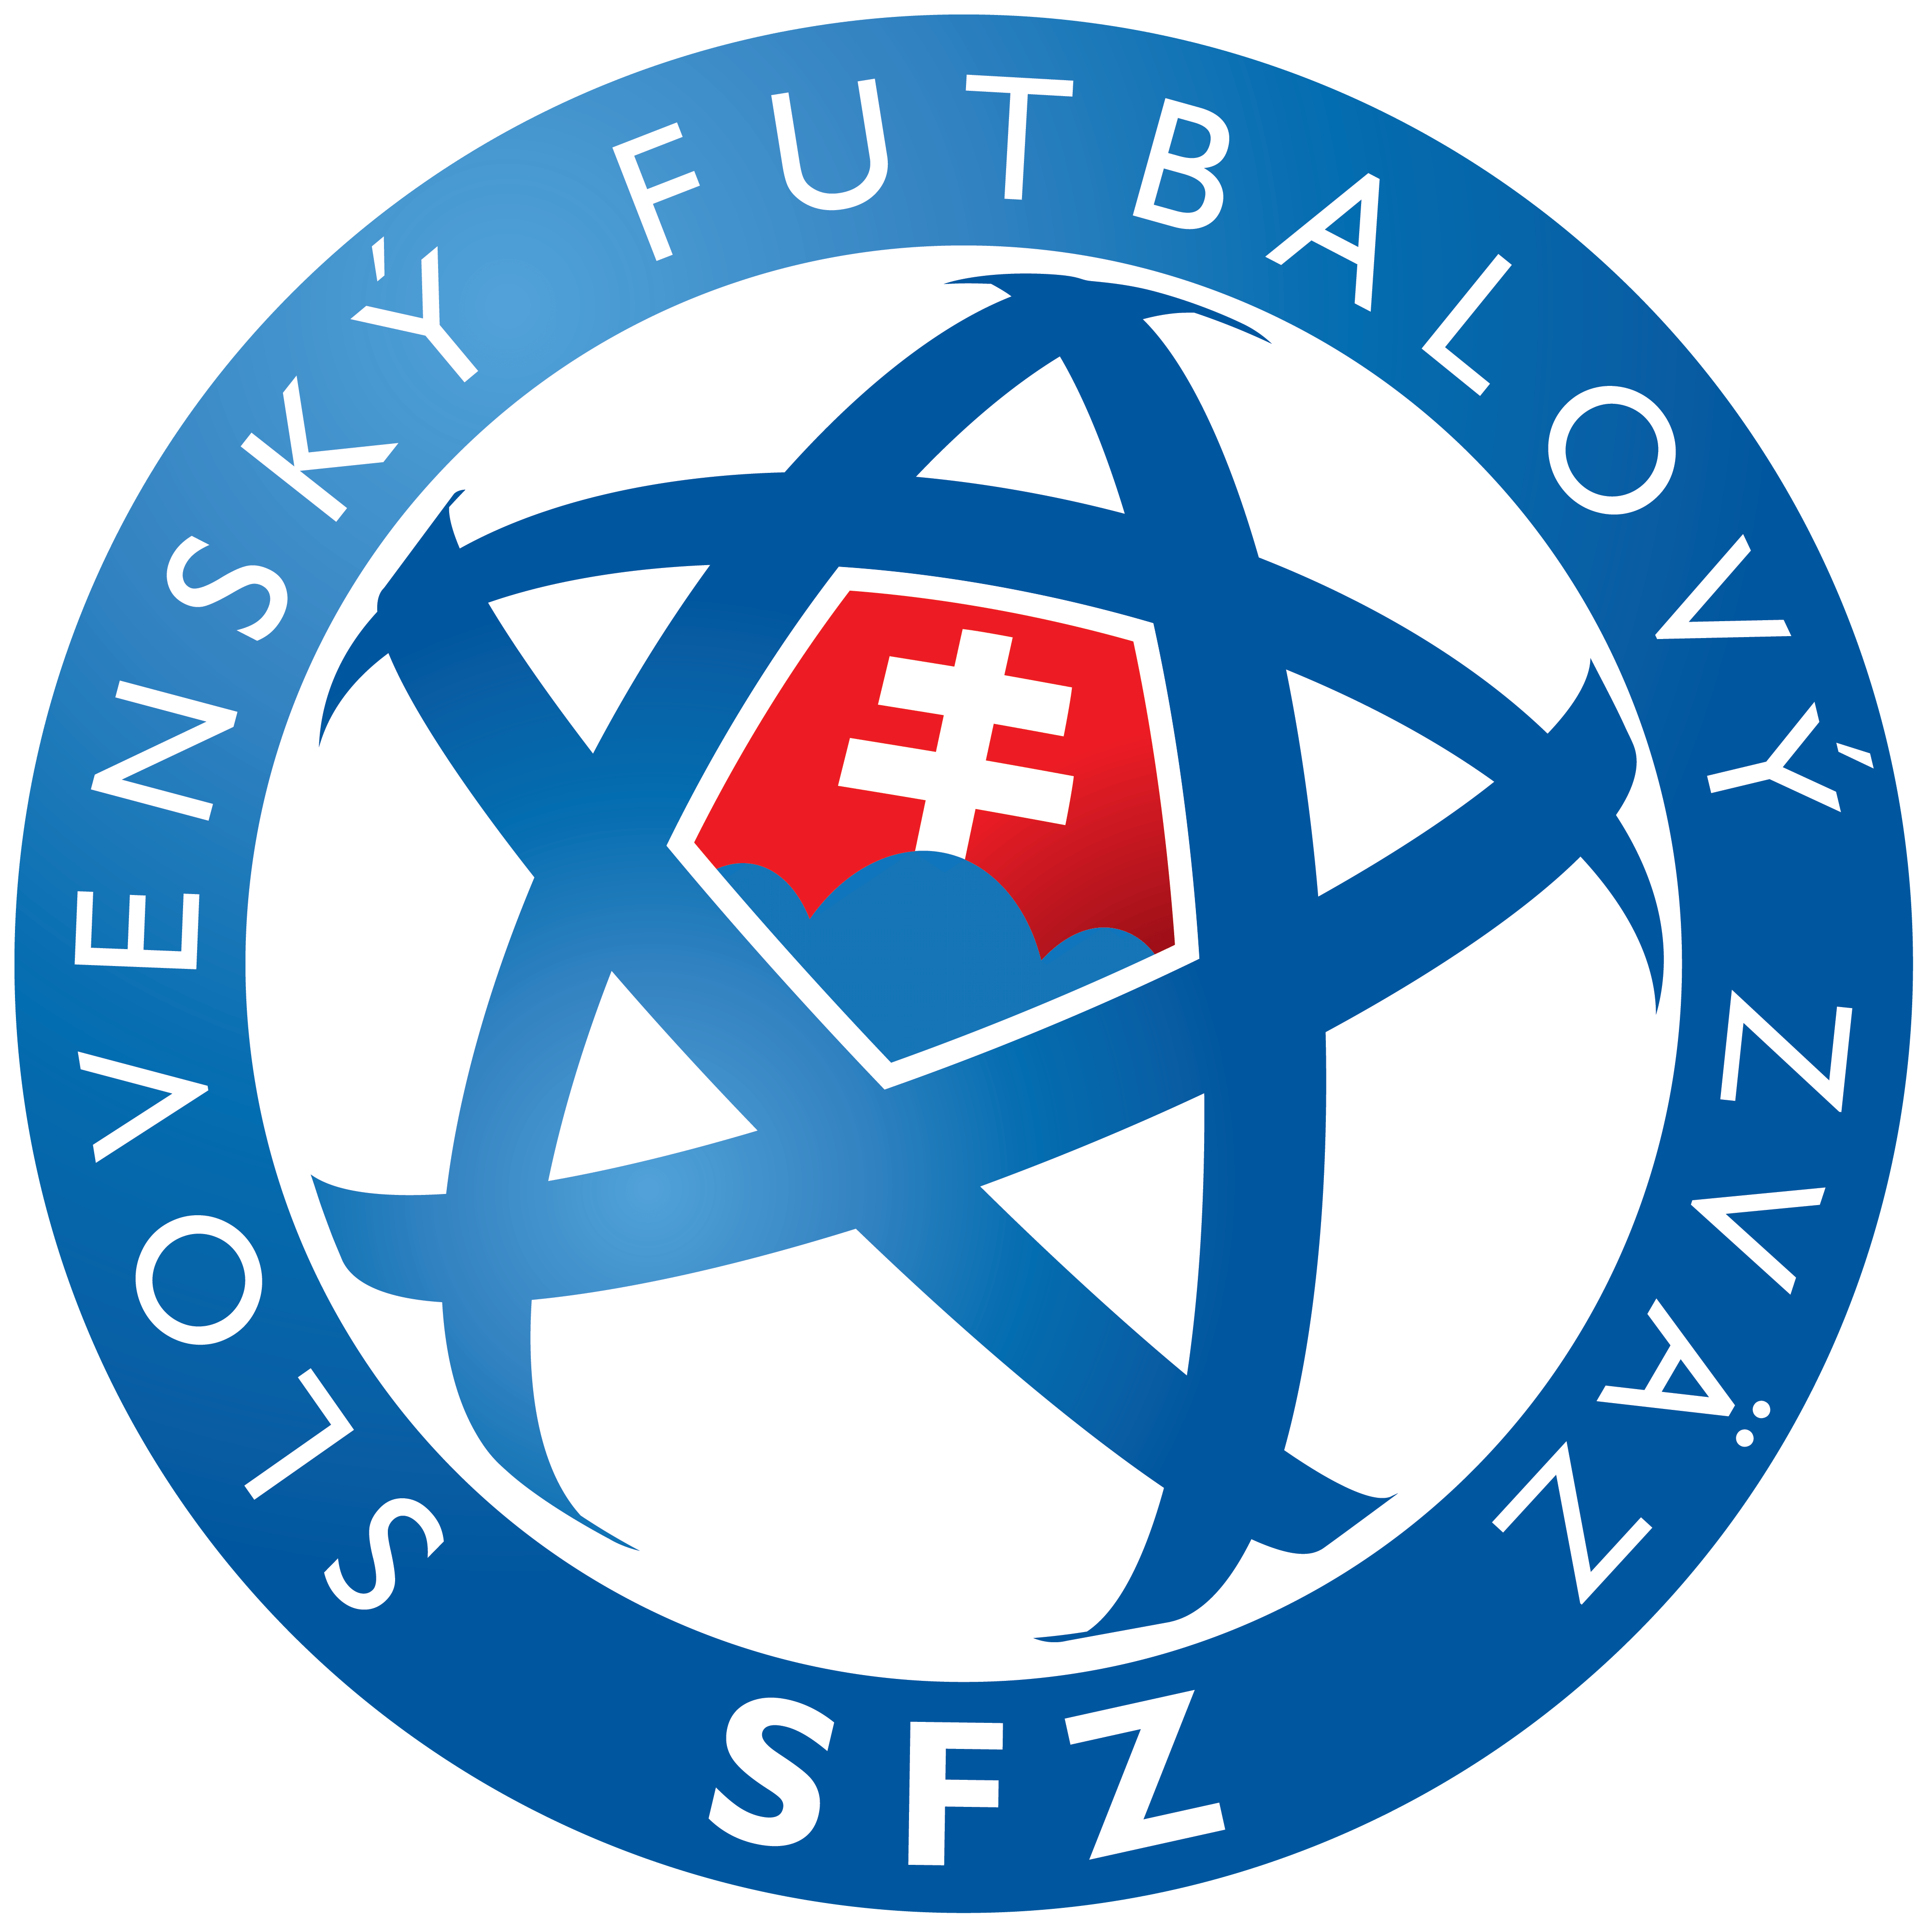 Albania National Football Team Png - Slovakia National Football Team Logo, Sfz Logotype, Transparent background PNG HD thumbnail